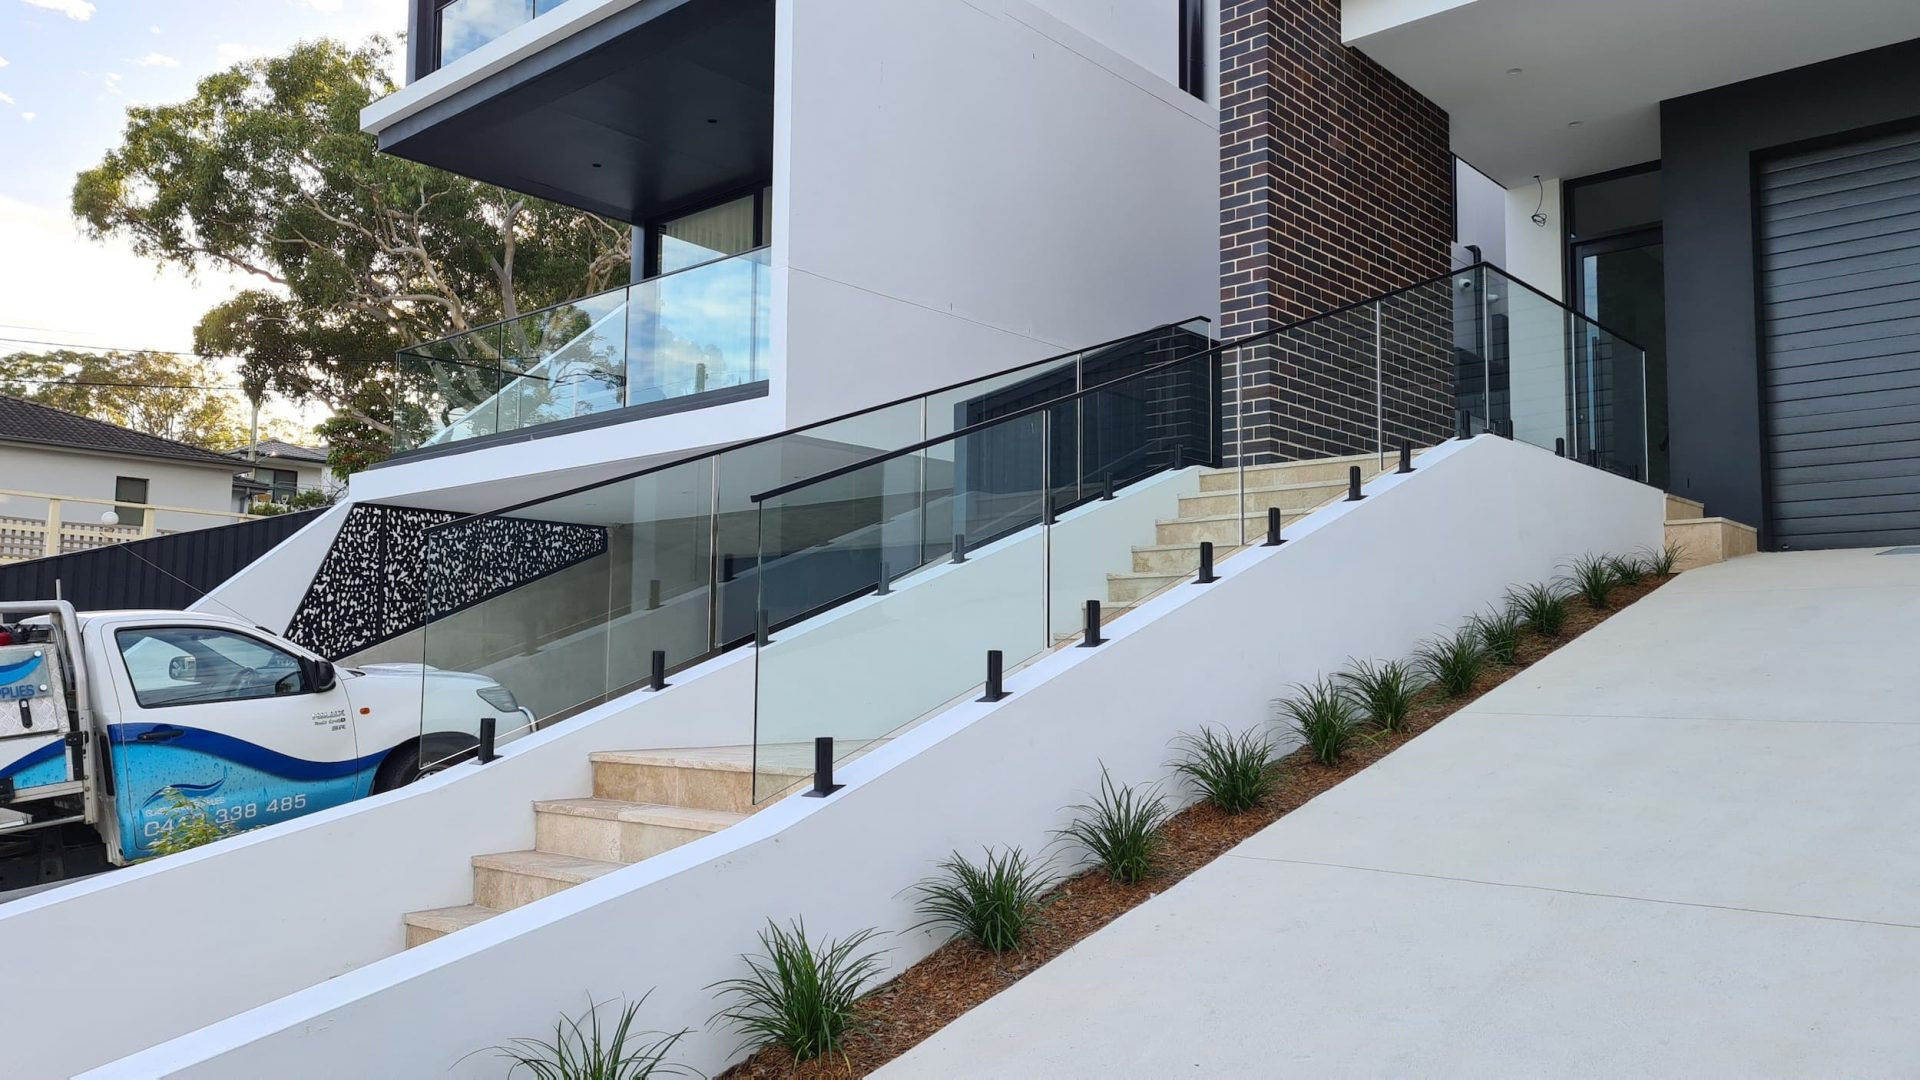 External Stairs Glass Balustrades, Oatley - Glass Fence Supplies